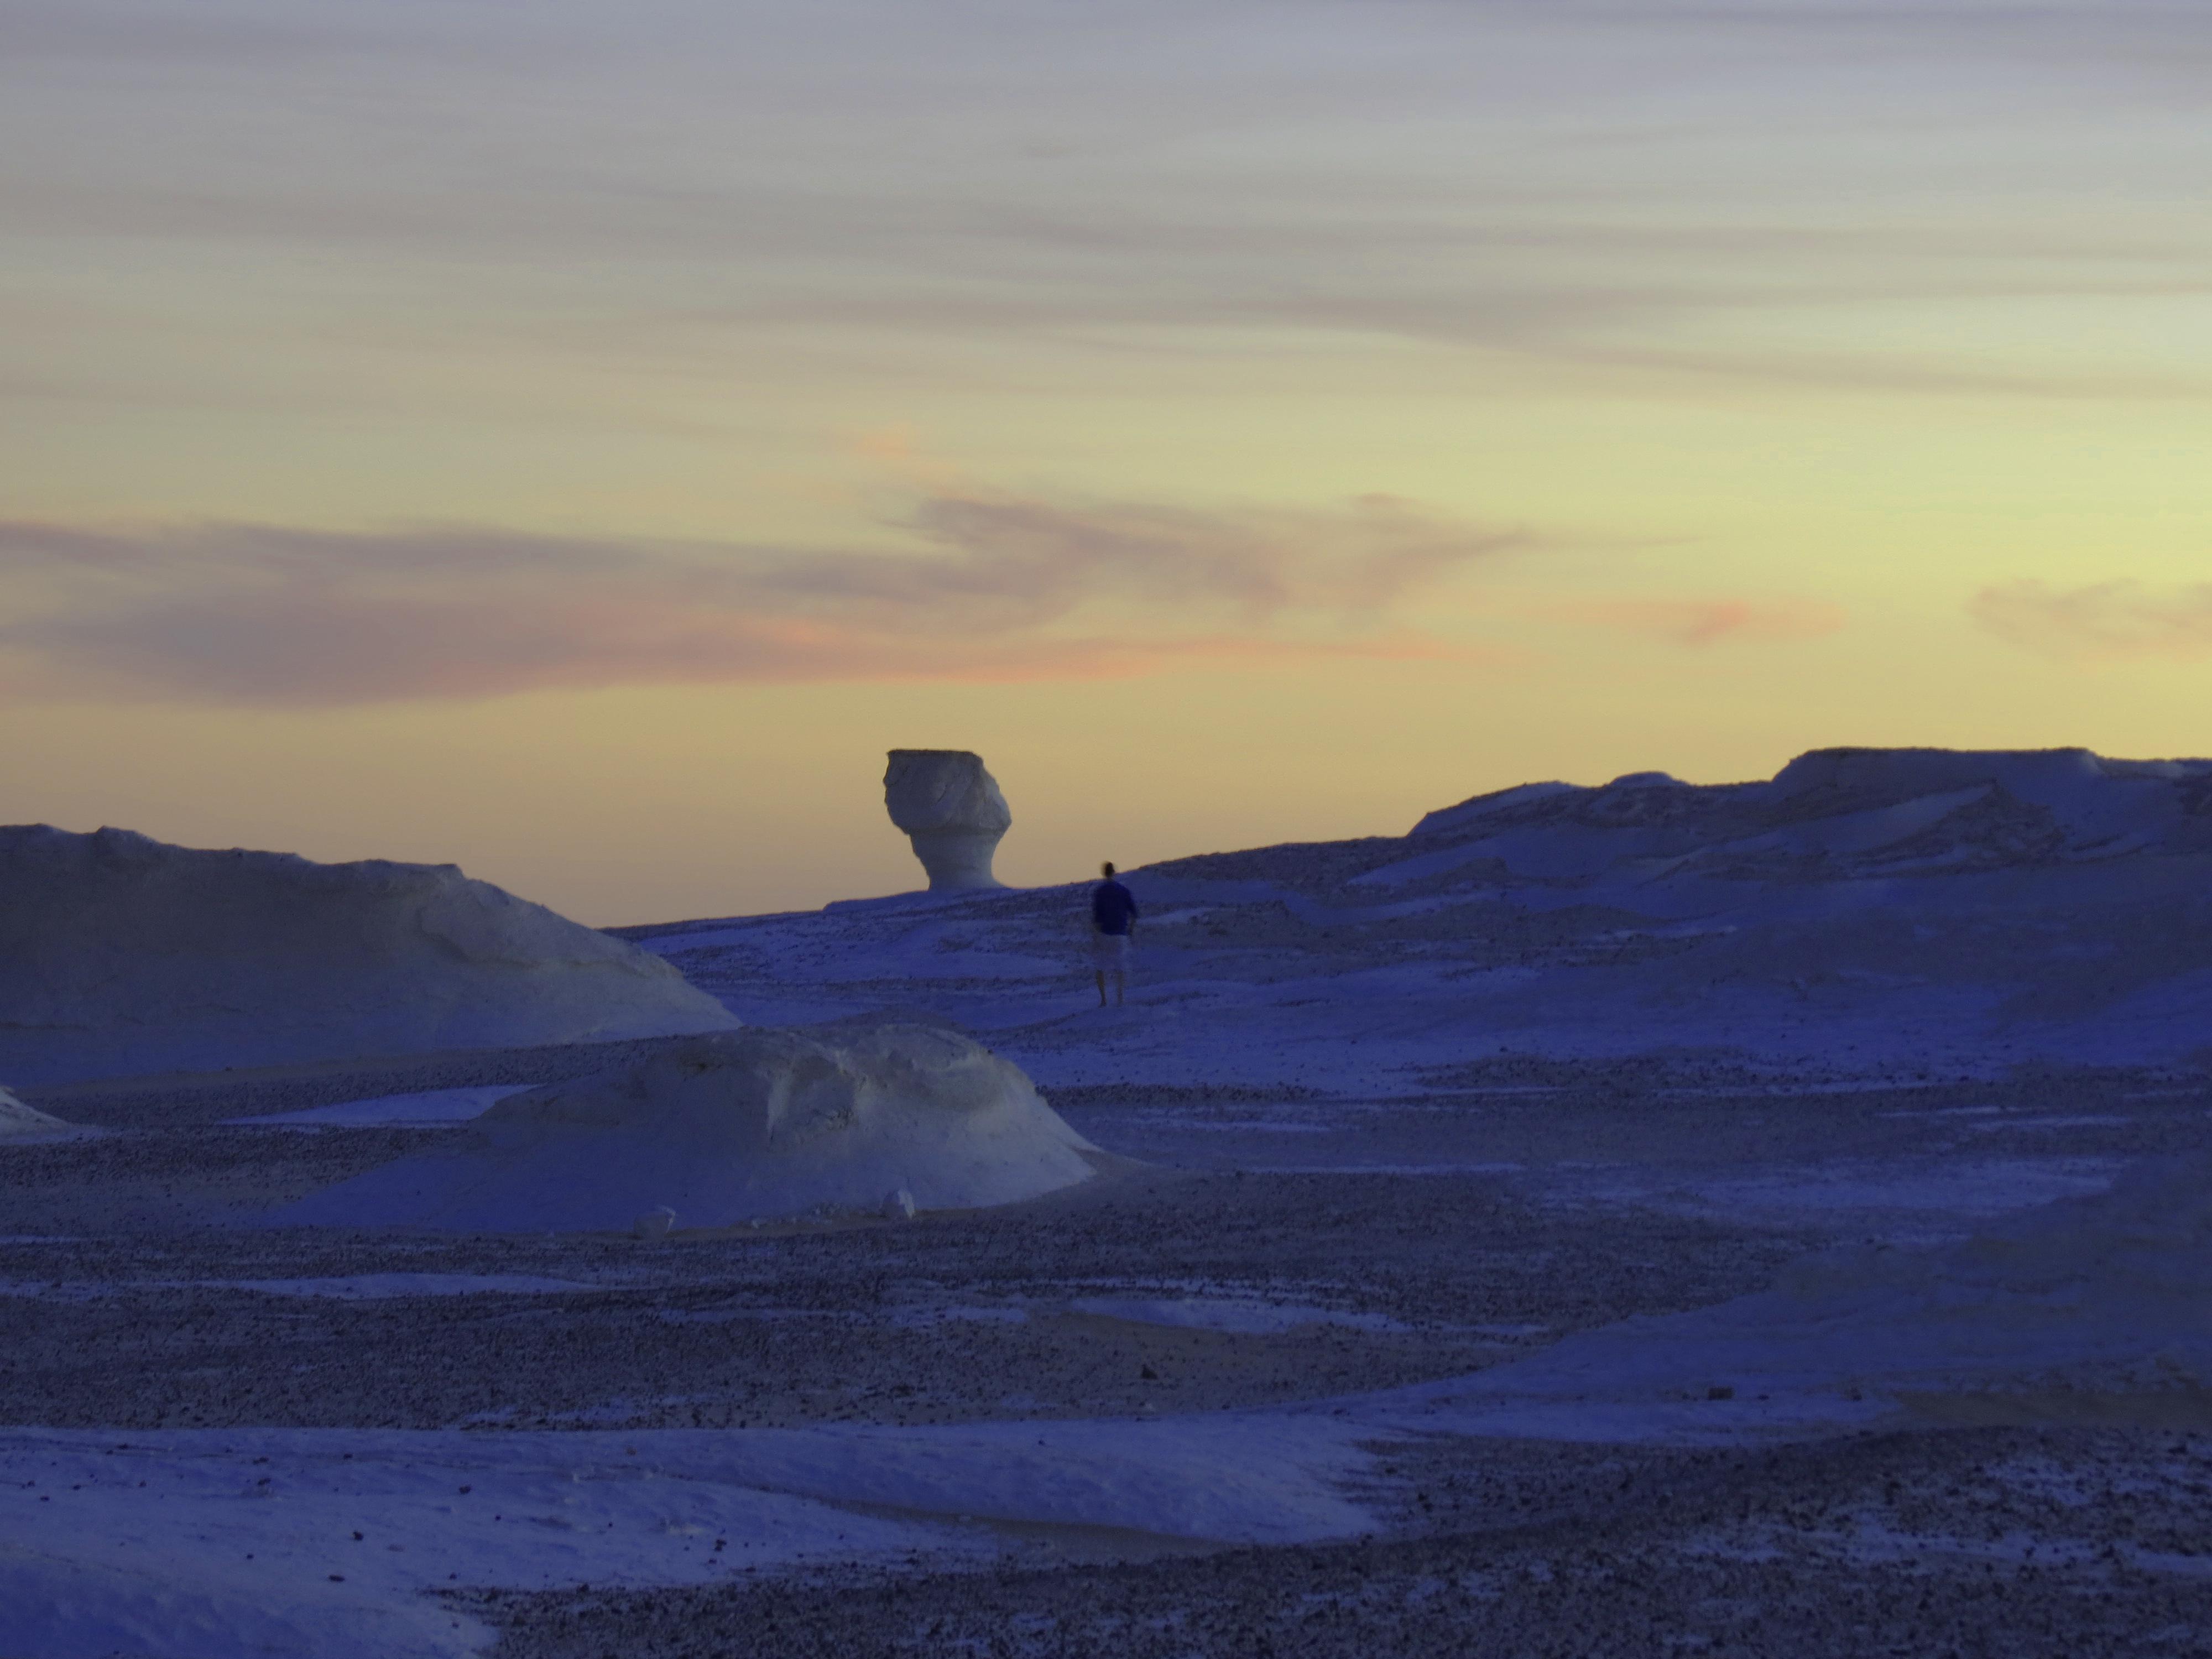 白沙漠  White Desert   -4